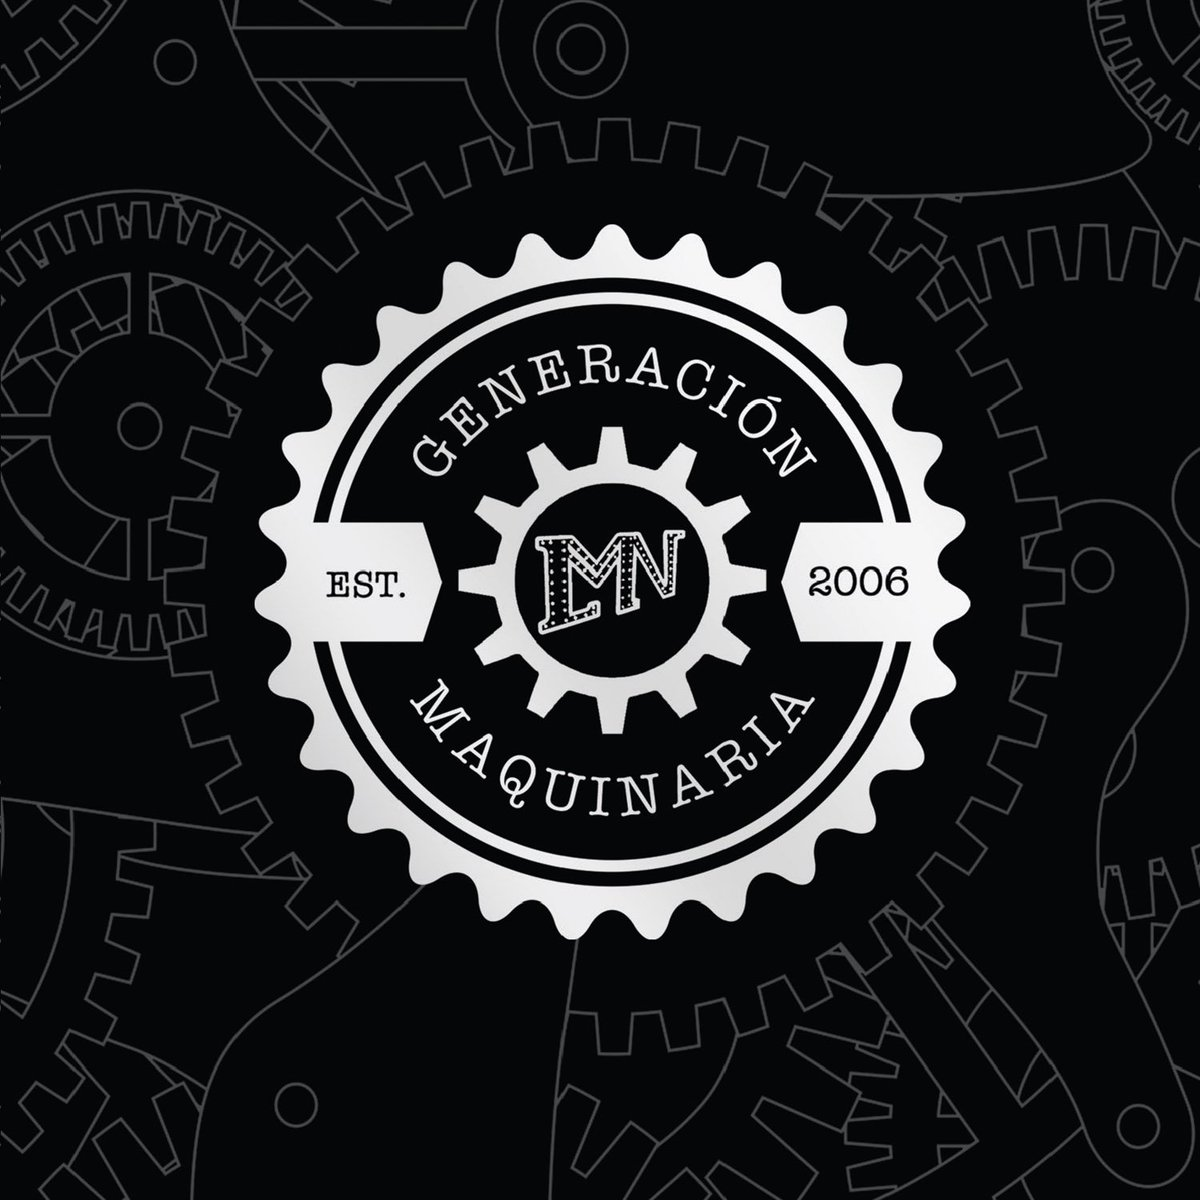 .@la_maquinaria  #GeneraciónMaquinariaEst2006 disponible ya para Pre-Orden. https://t.co/OWXvlDVx9z